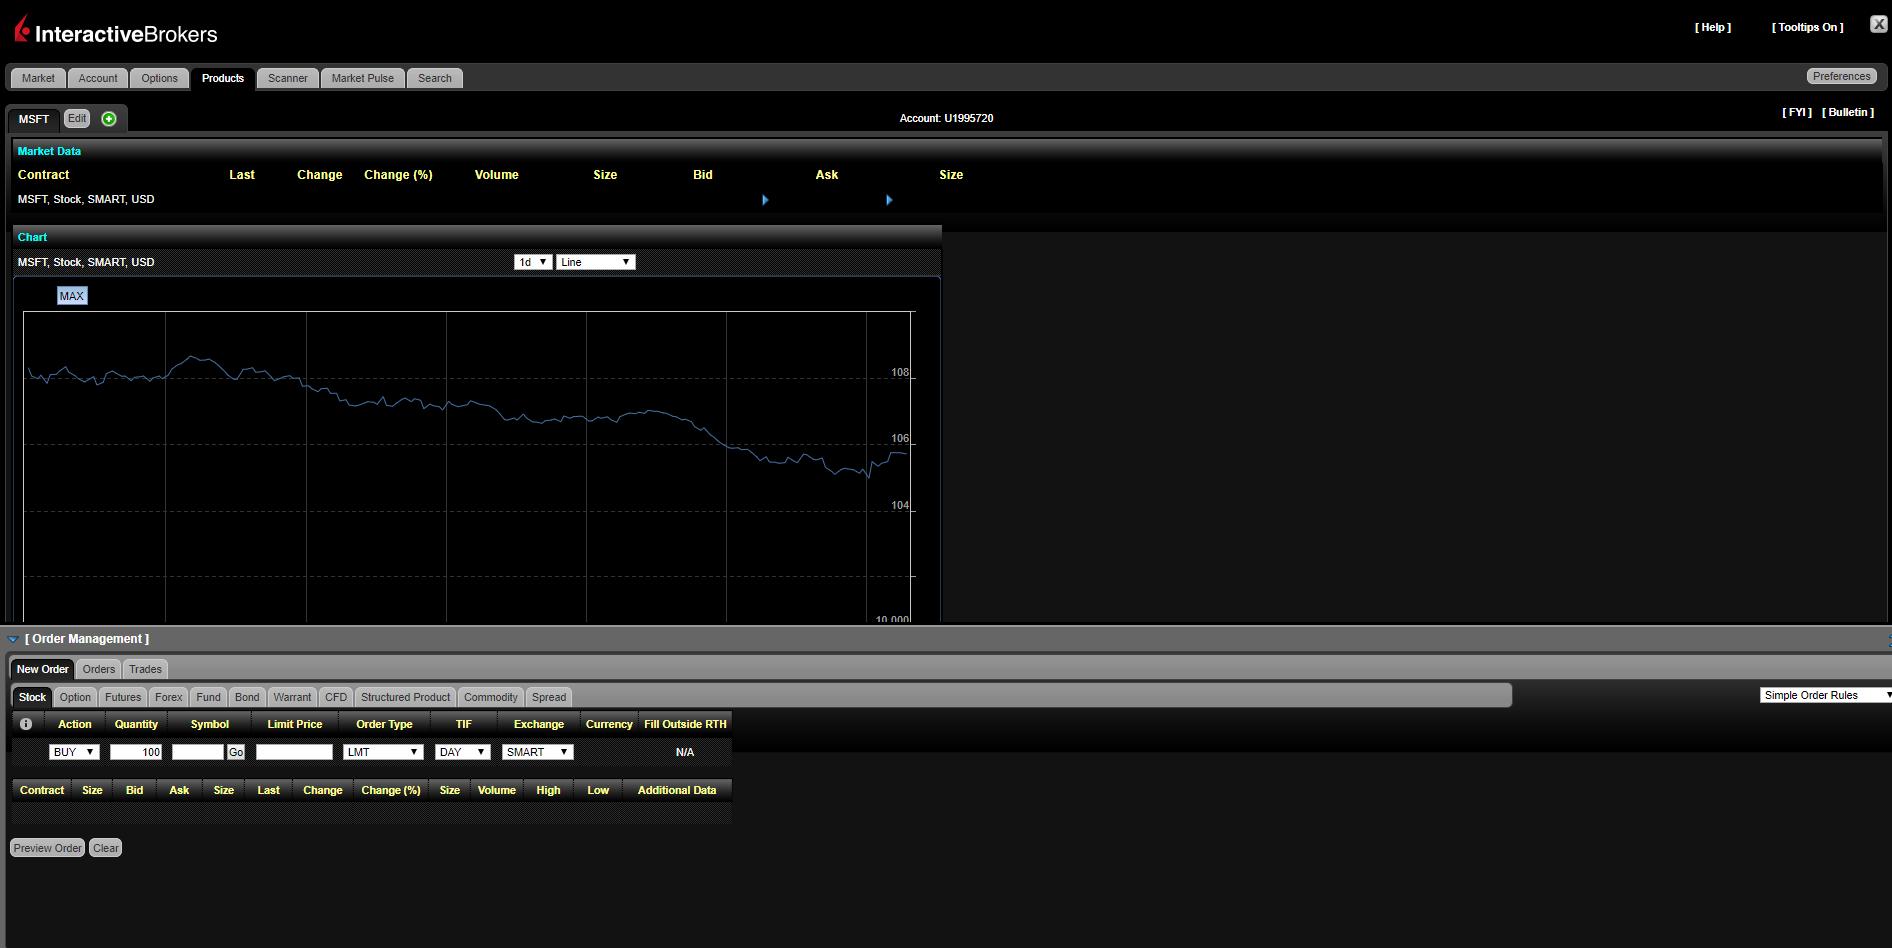 Futures options trading - Interactive Brokers - Web trading platform